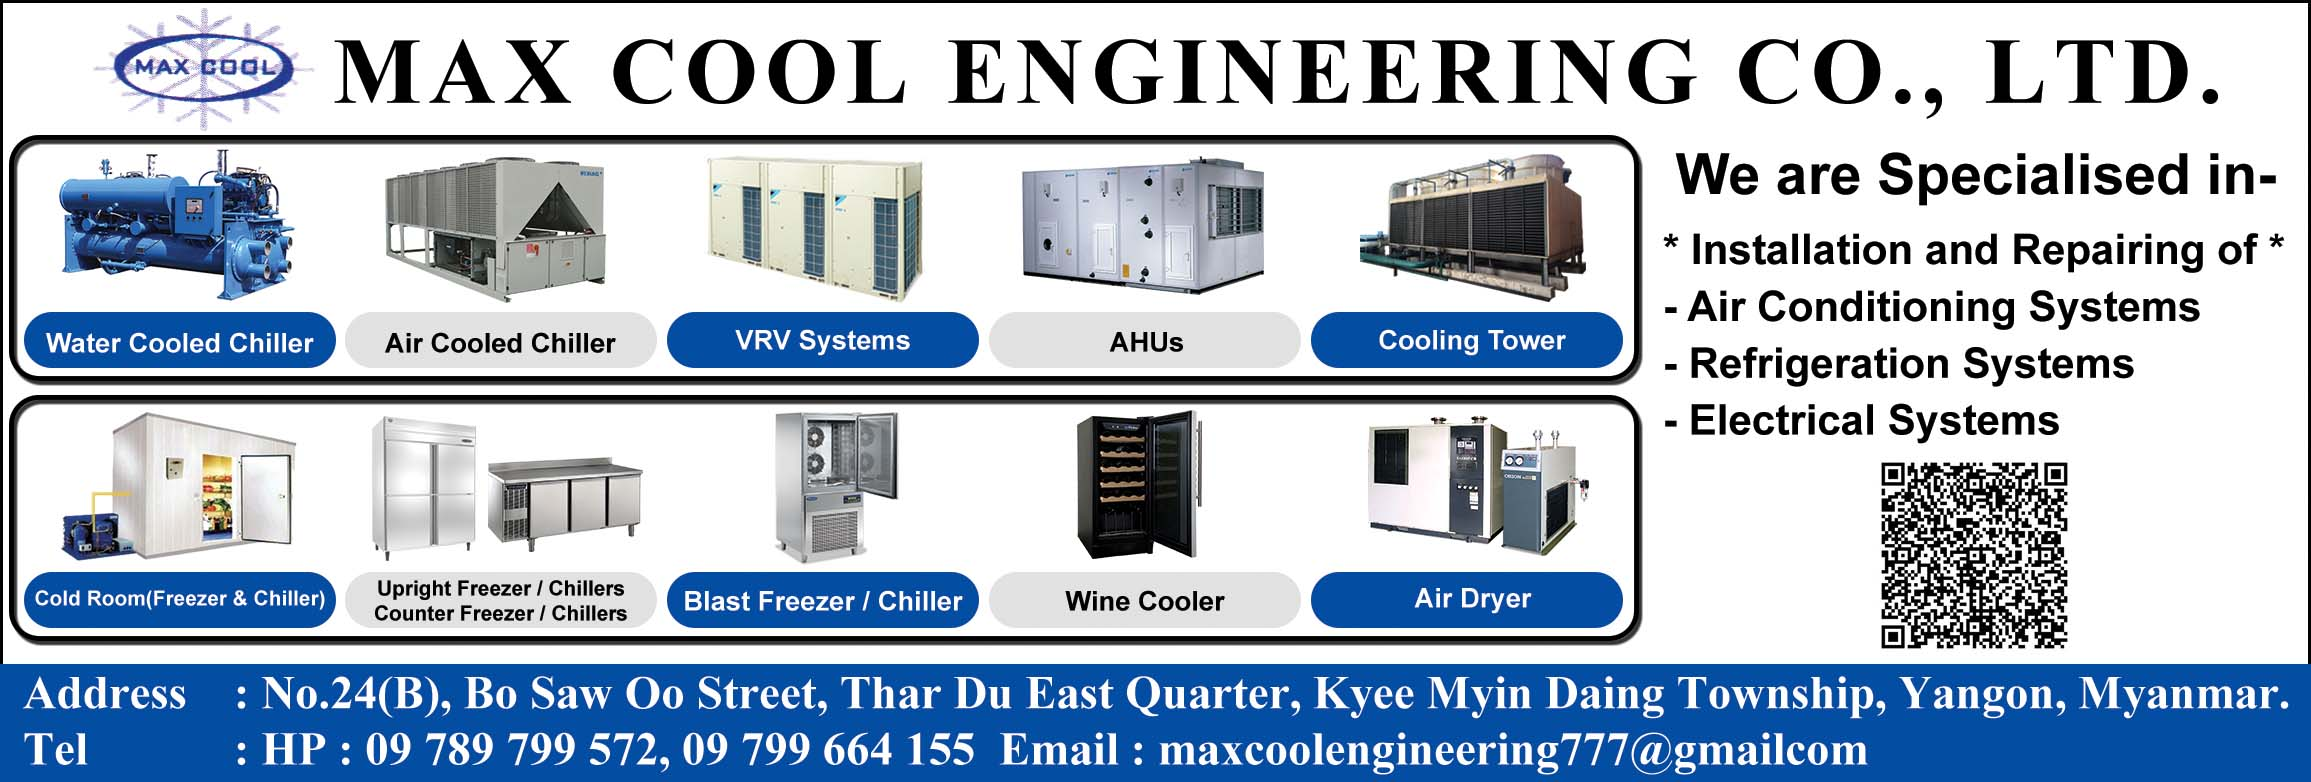 Max Cool Engineering Co., Ltd.